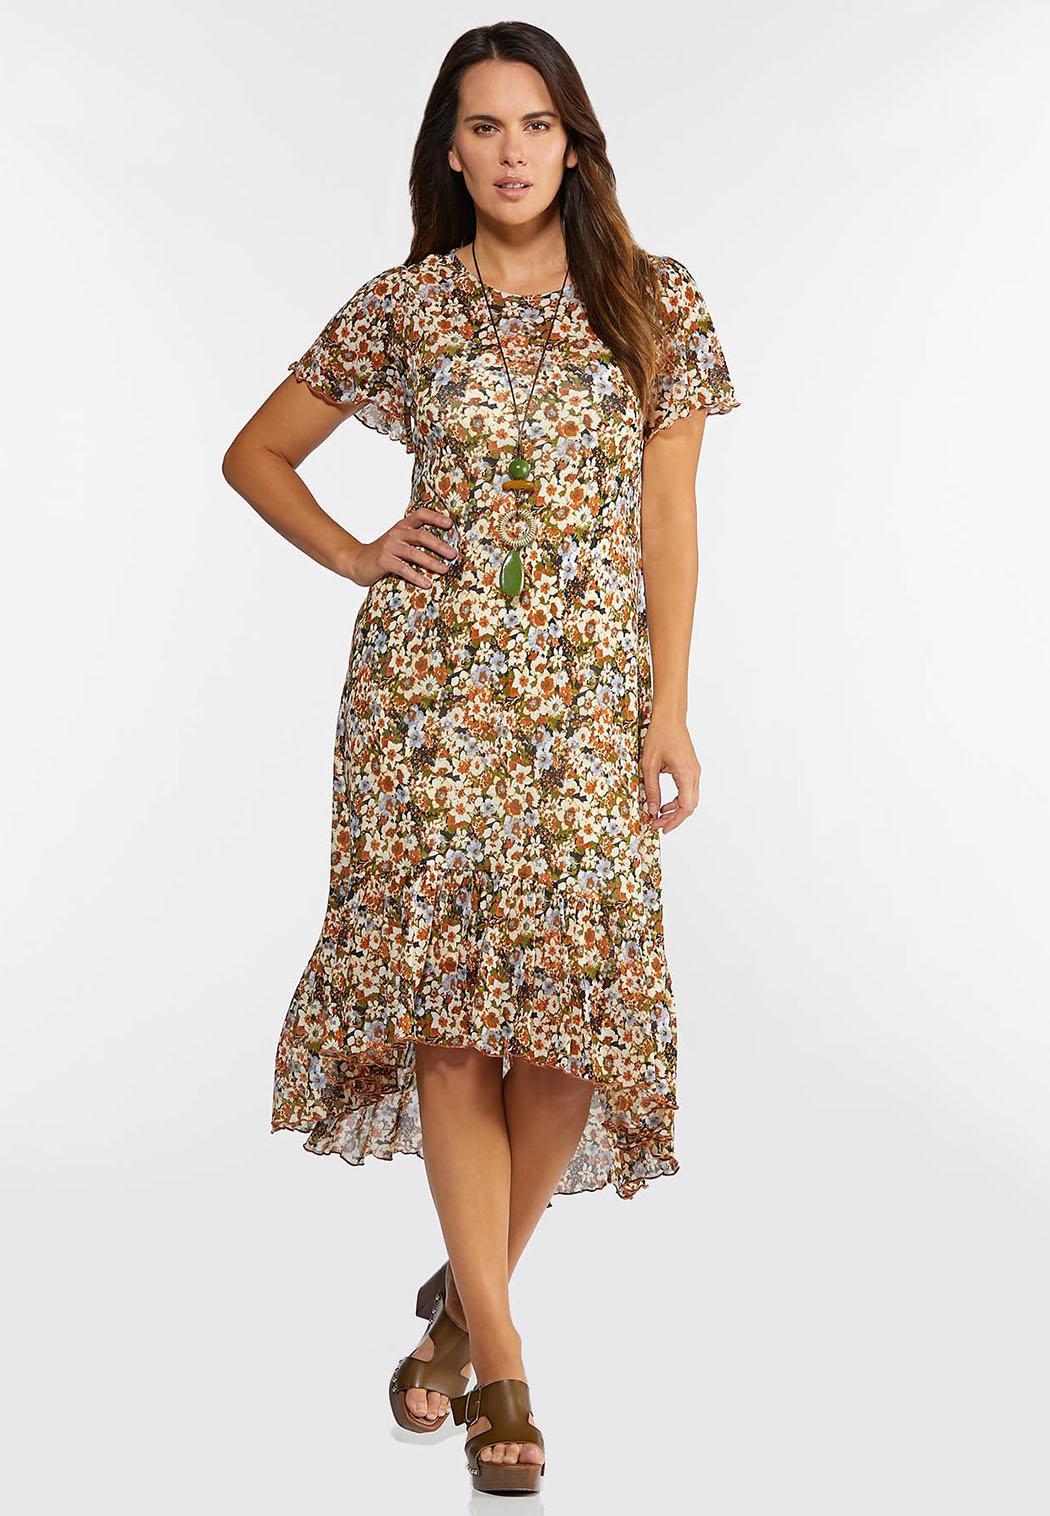 Plus Size Mesh Floral High-Low Dress